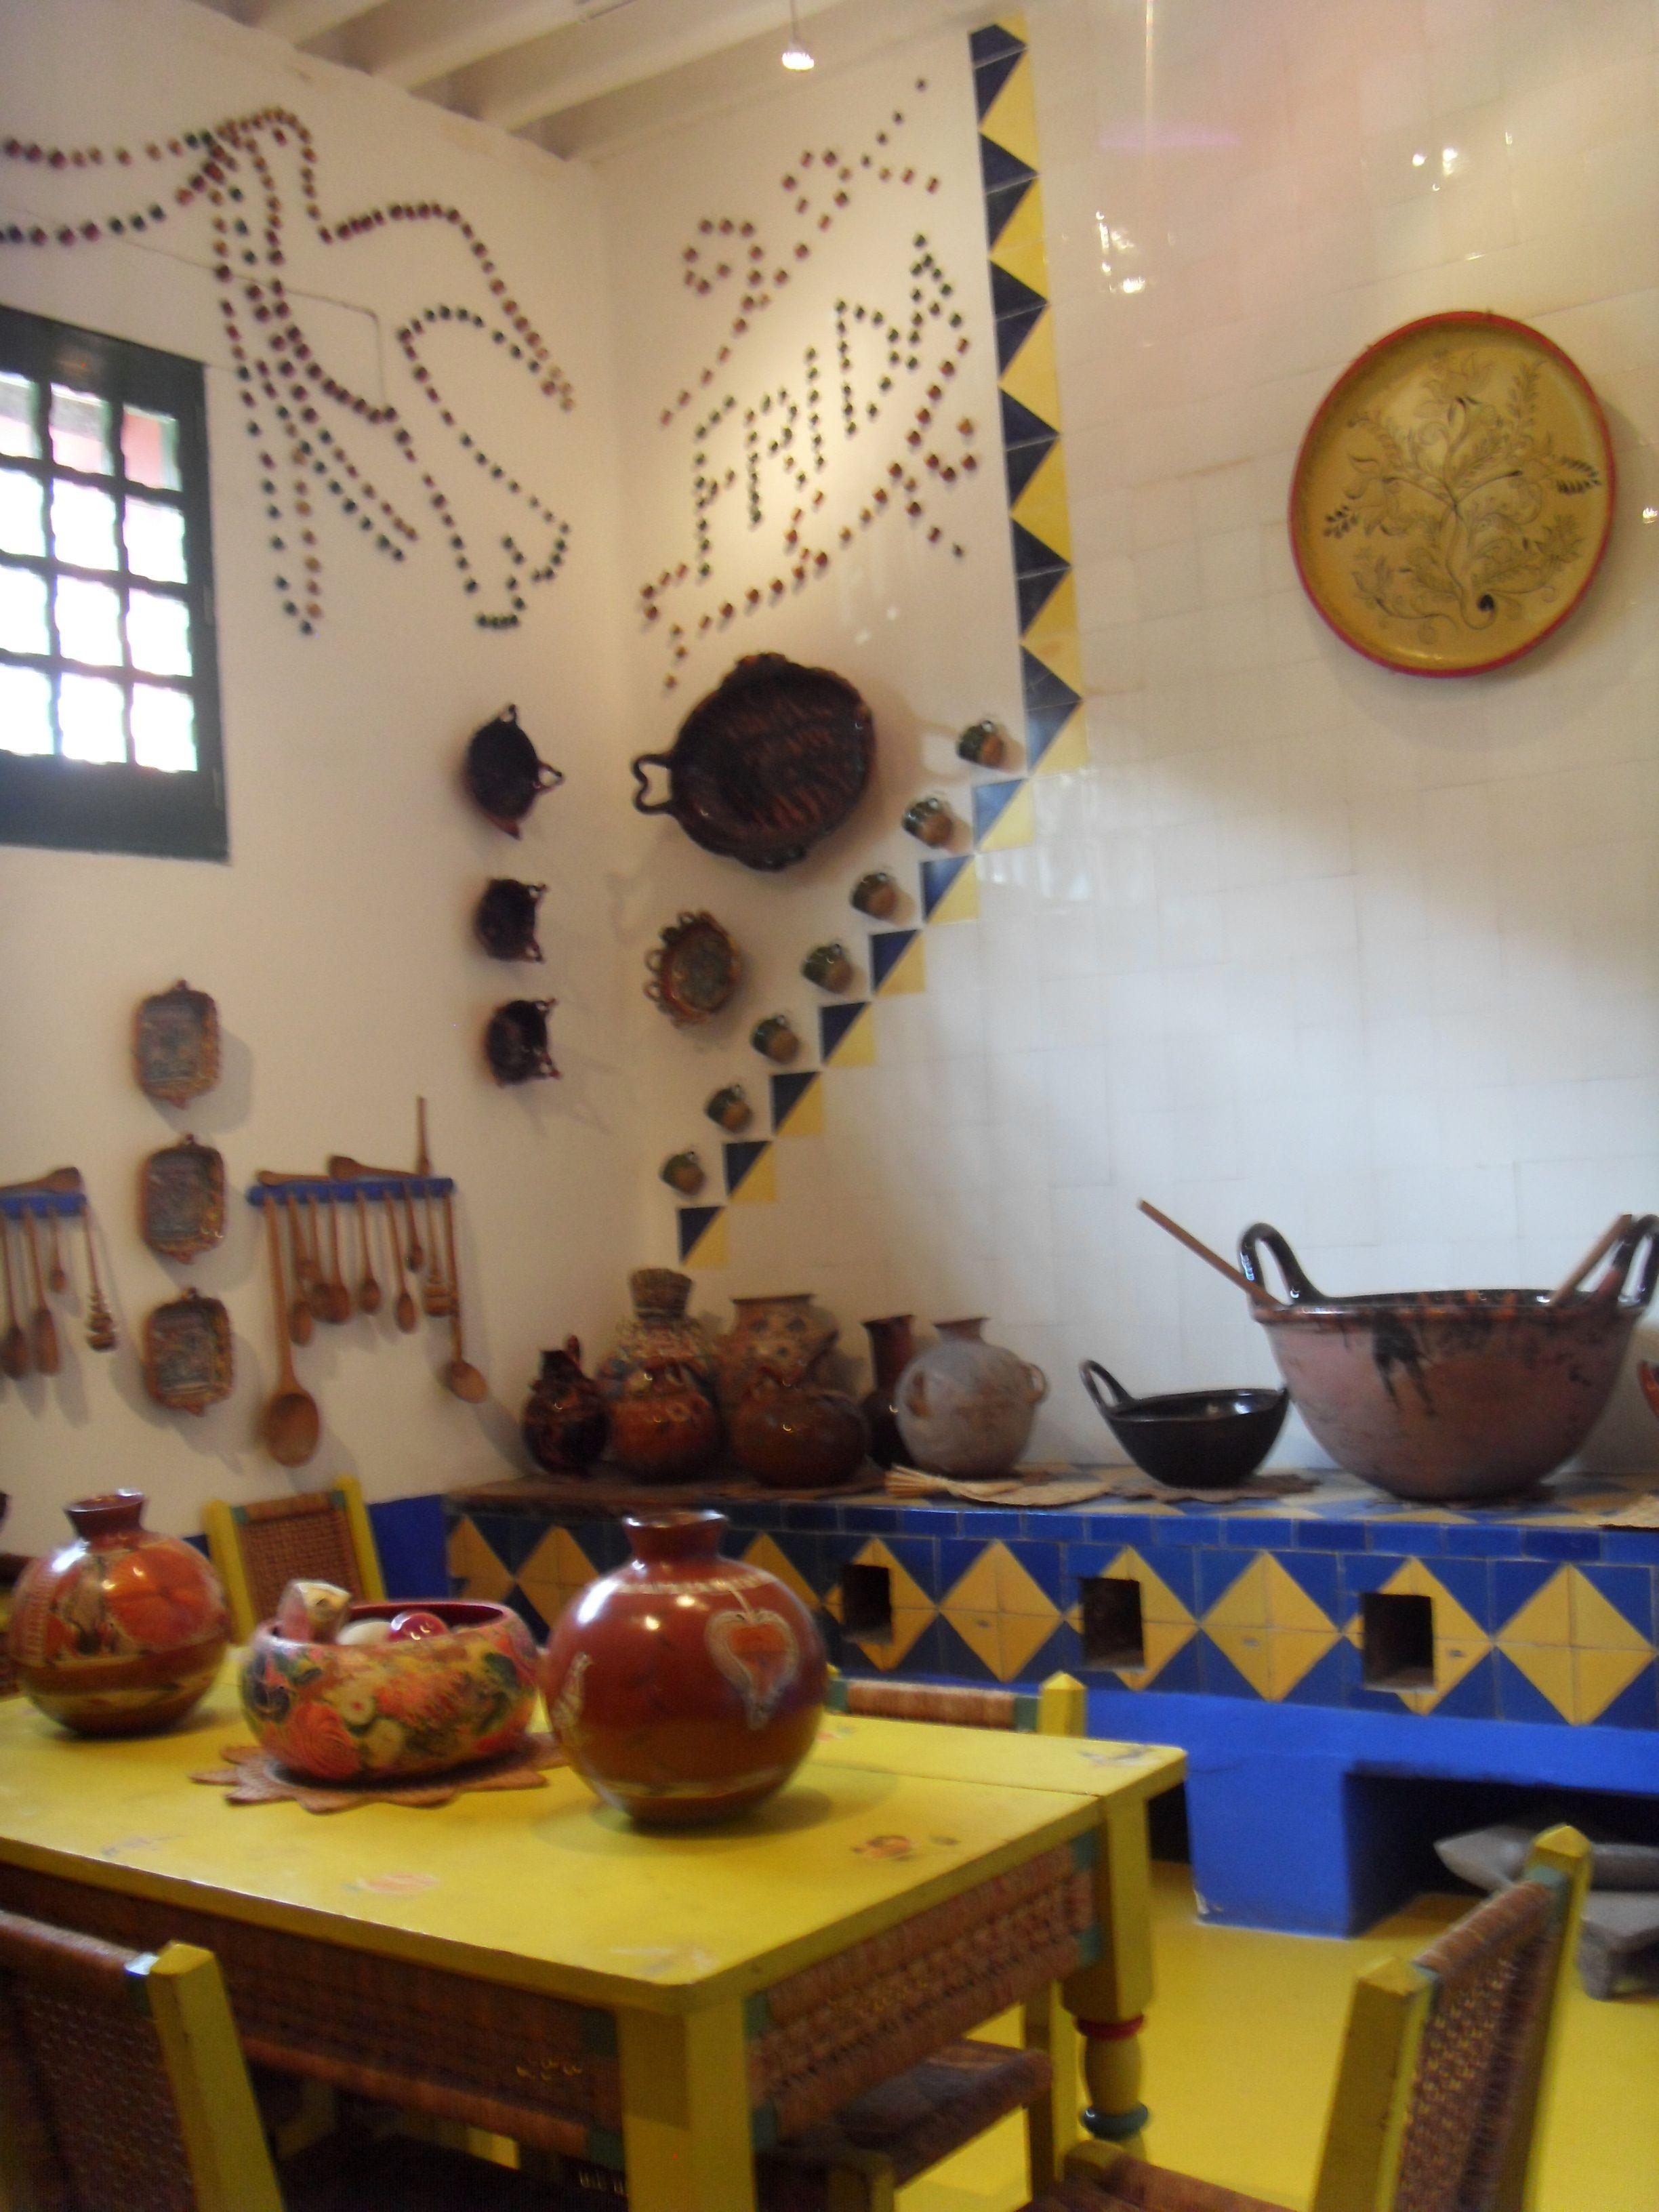 Cocina De La Casa Azul De Frida Kalho Frida And Diego Mexican Decor Mexican Home Decor